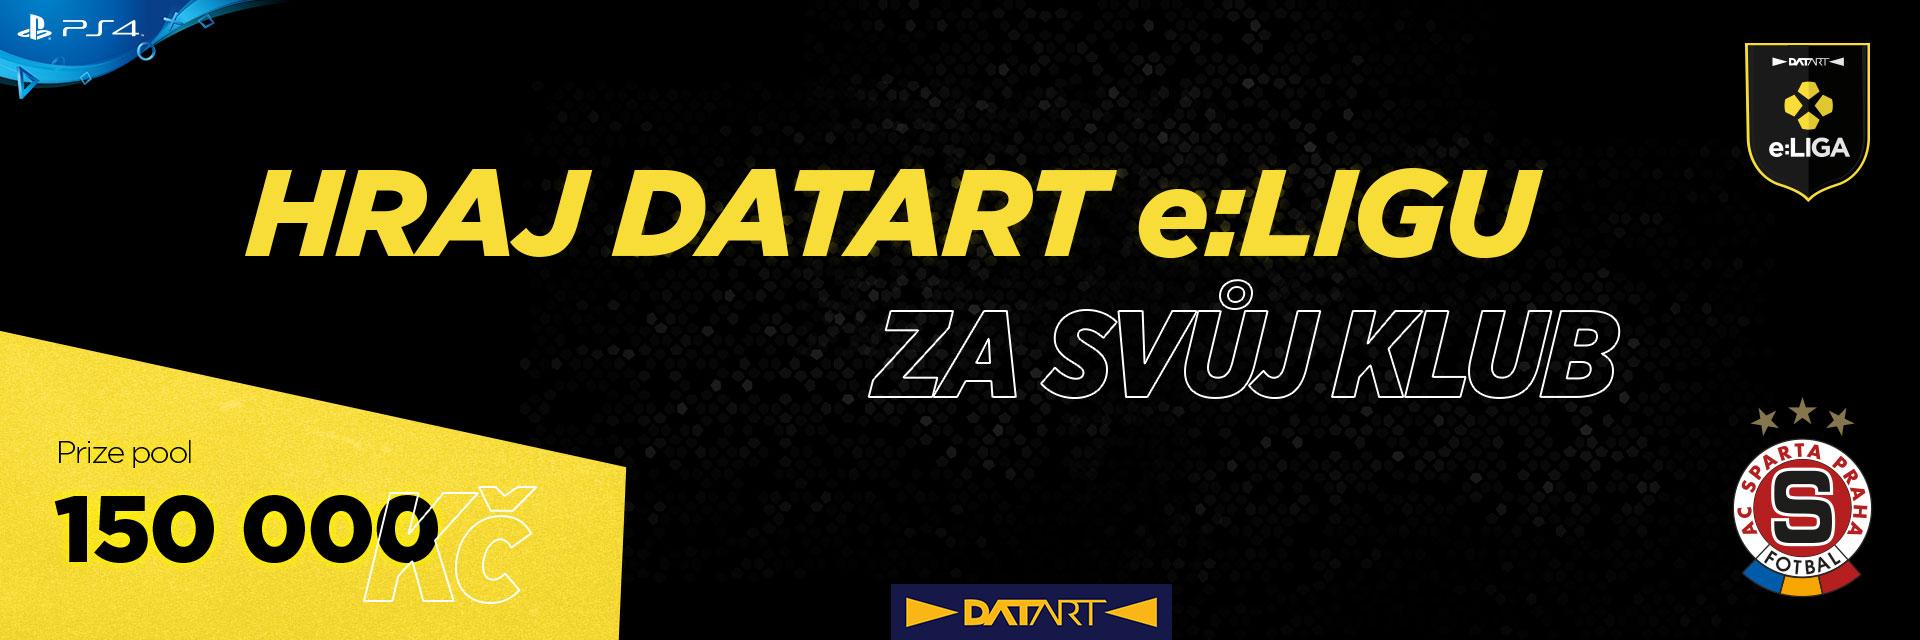 datart-e-liga-semifinale-ac-sparta-praha